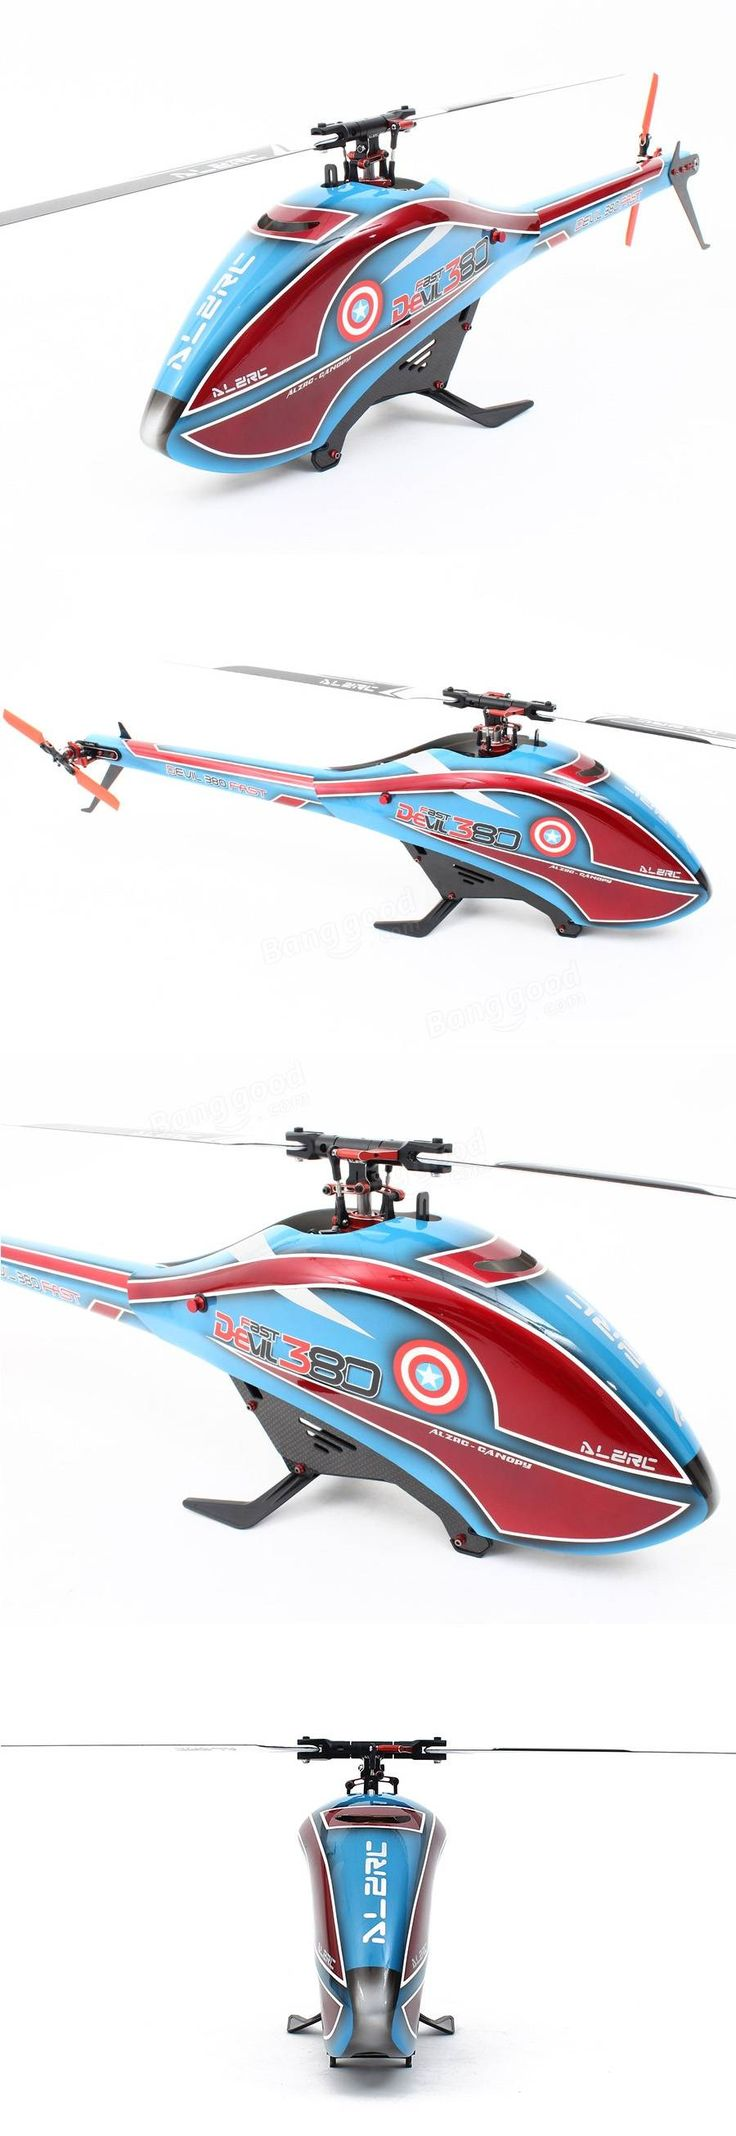 ALZRC Devil 380 FAST RC Helicopter Standard Combo Sale - Banggood.com